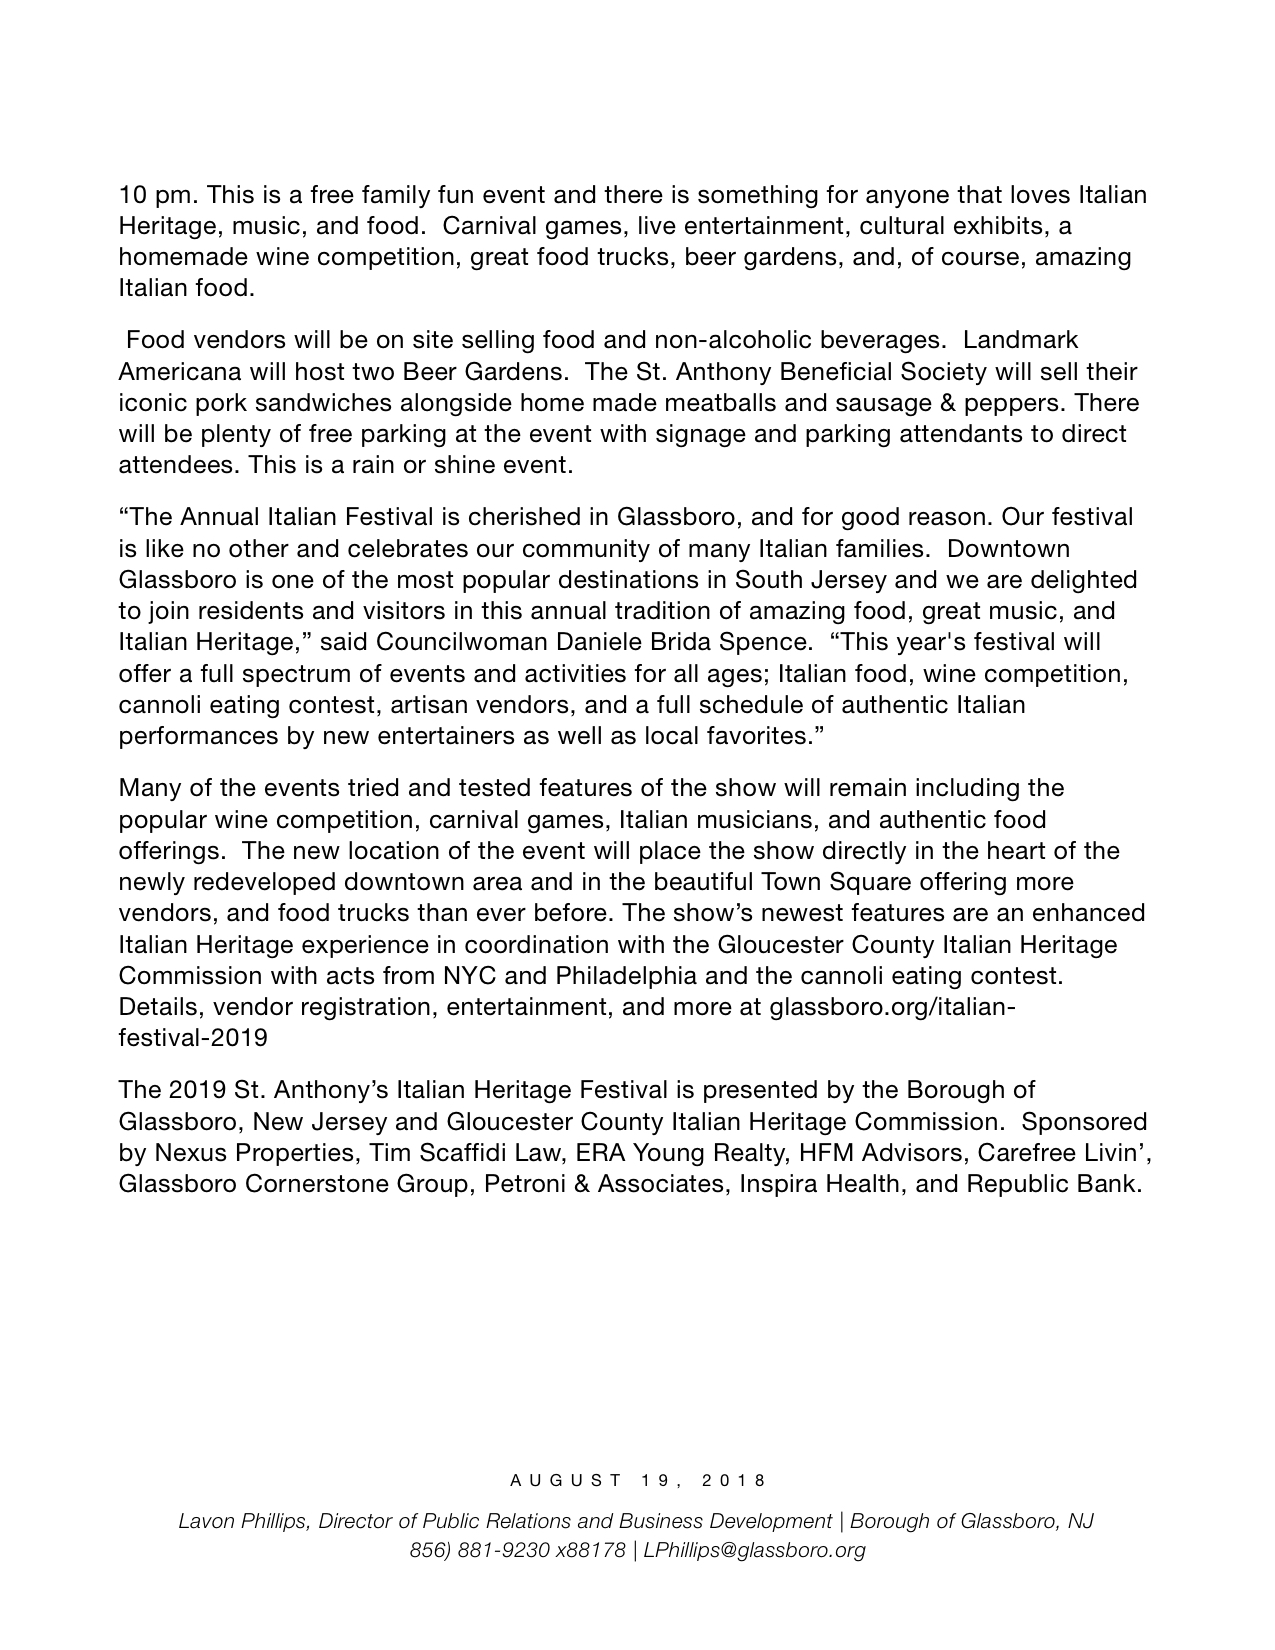 Glassboro NJ Press Release 2019 ST. ANTHONY ITALIAN HERITAGE FESTIVAL.jpeg